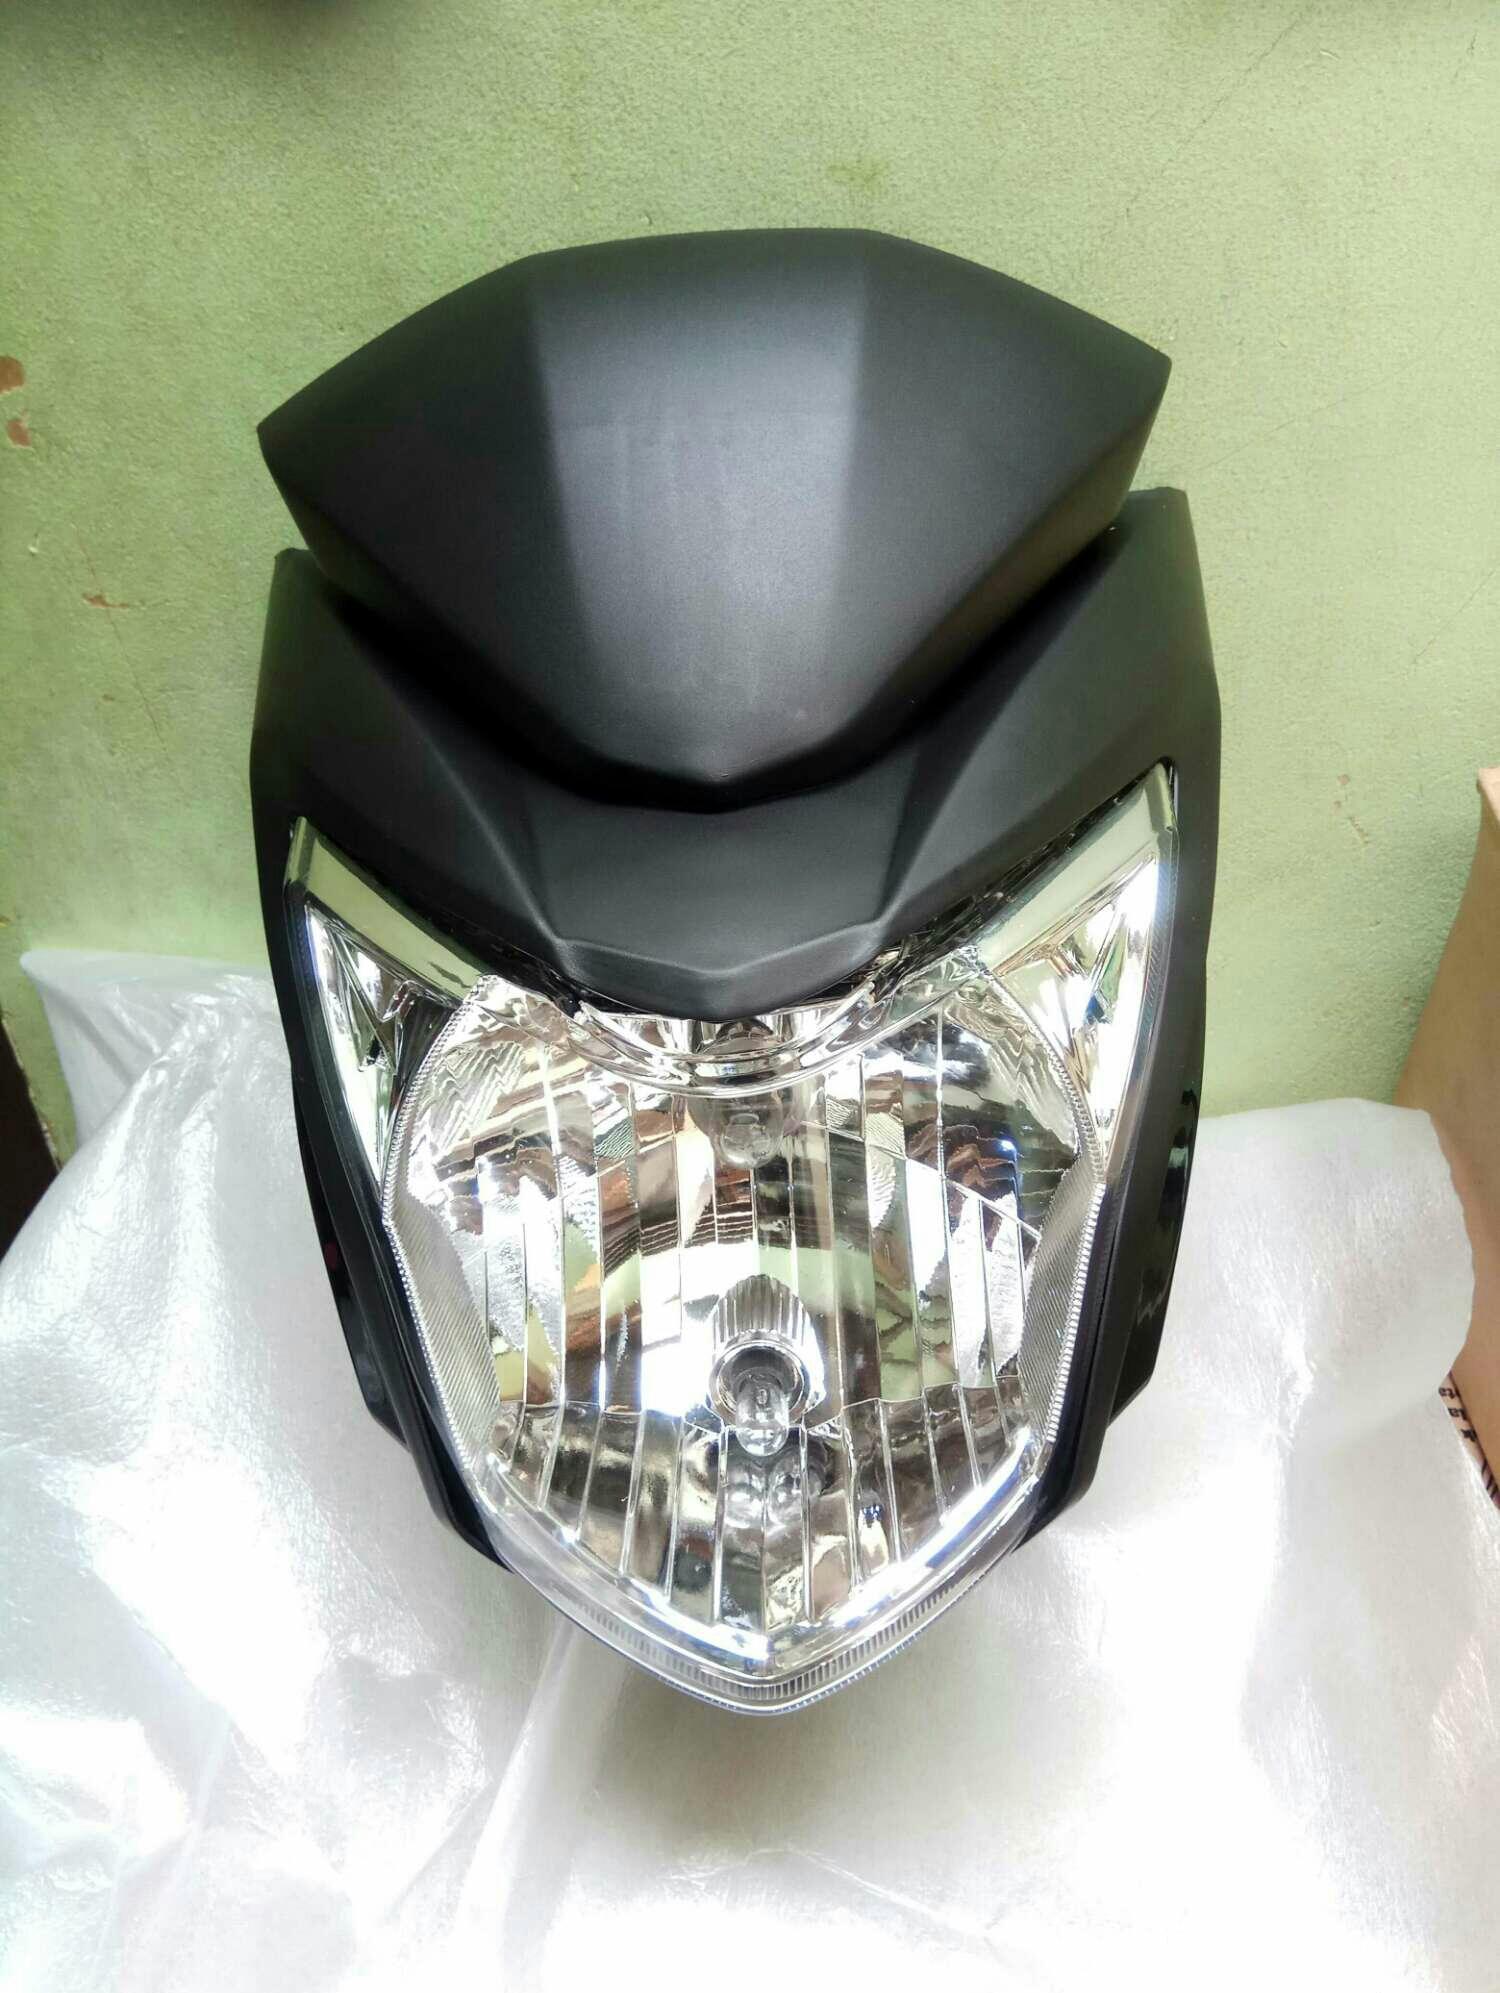 kedok lampu depan honda verza 150cc kwsuper high quality merk narita kualitas no 1